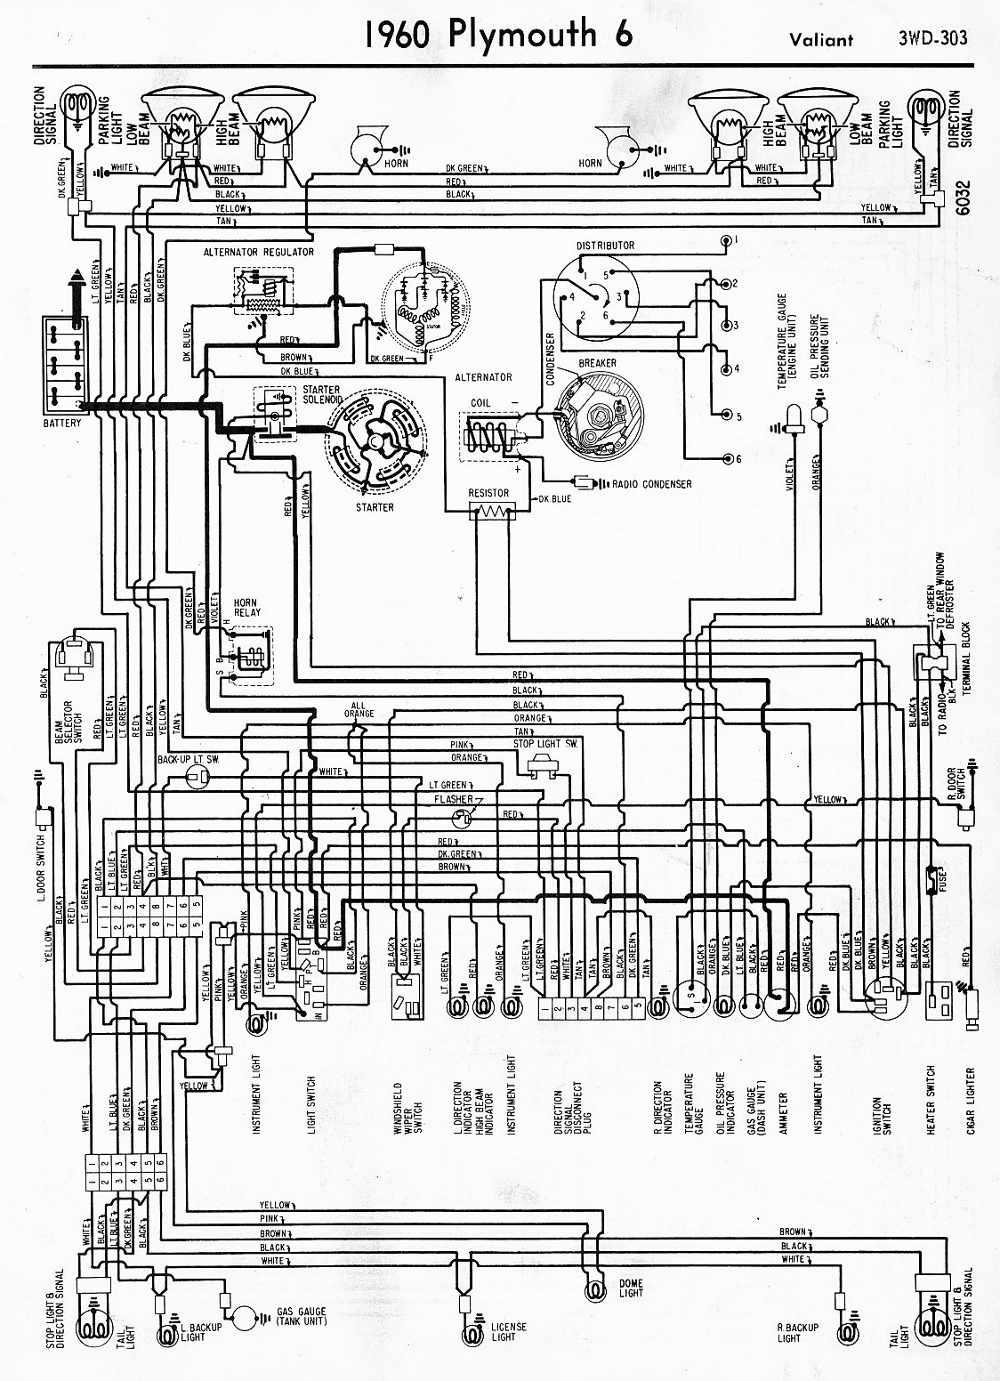 Wiring Diagram For 1966 Plymouth Barracuda Libraries Mopar Alternator Wire 1960 Radio Onlineplymouth Valiant Ac Schema Diagrams Mitsubishi